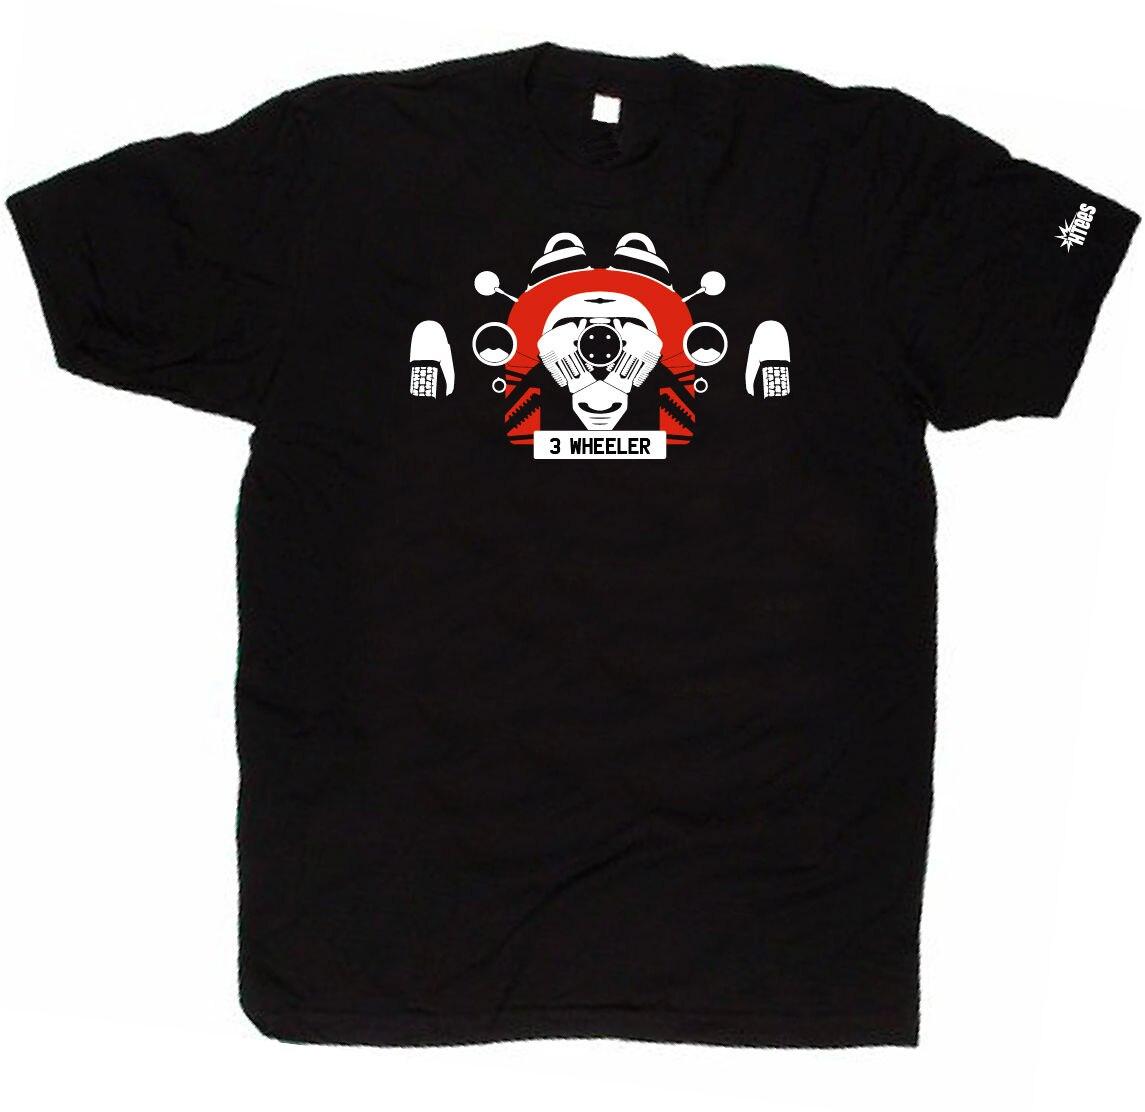 CUSTOM HTees T-shirt - MORGAN 3 WHEELER, Pick car colour & plate three wheels